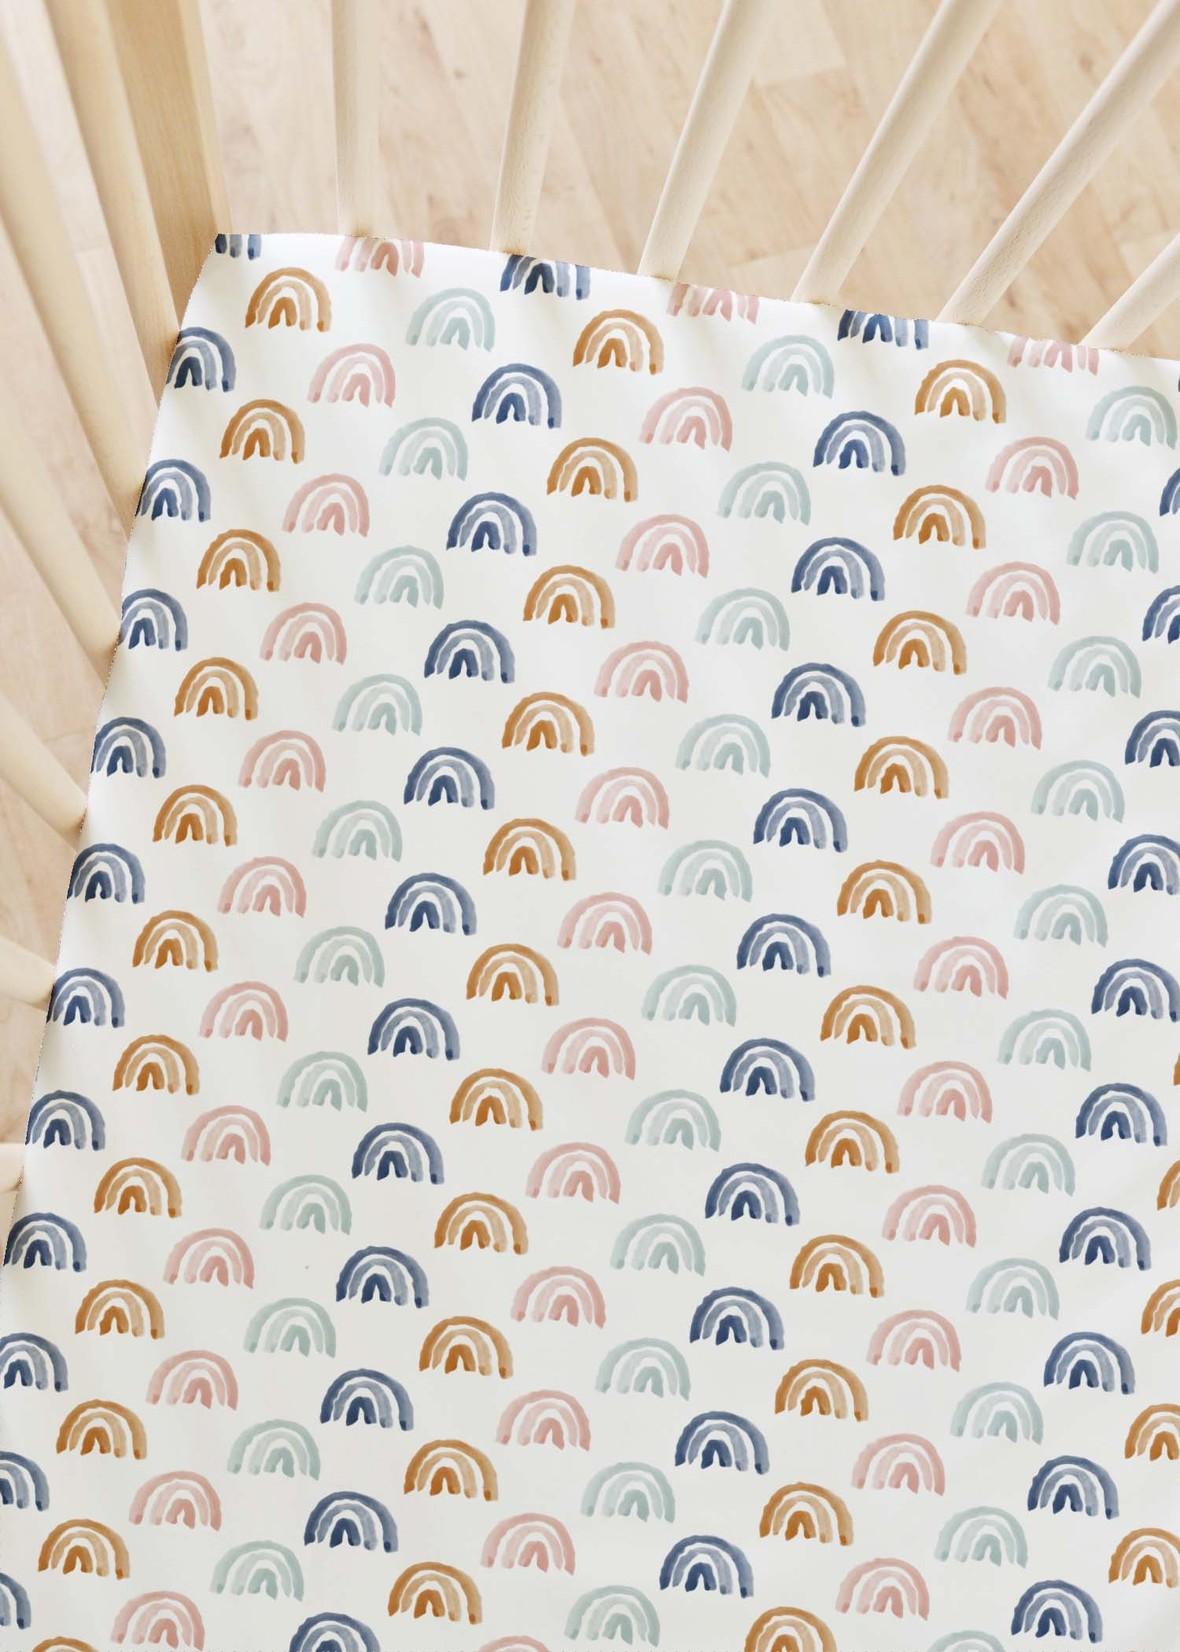 Crib Sheets Rainbow Row in Sunrise